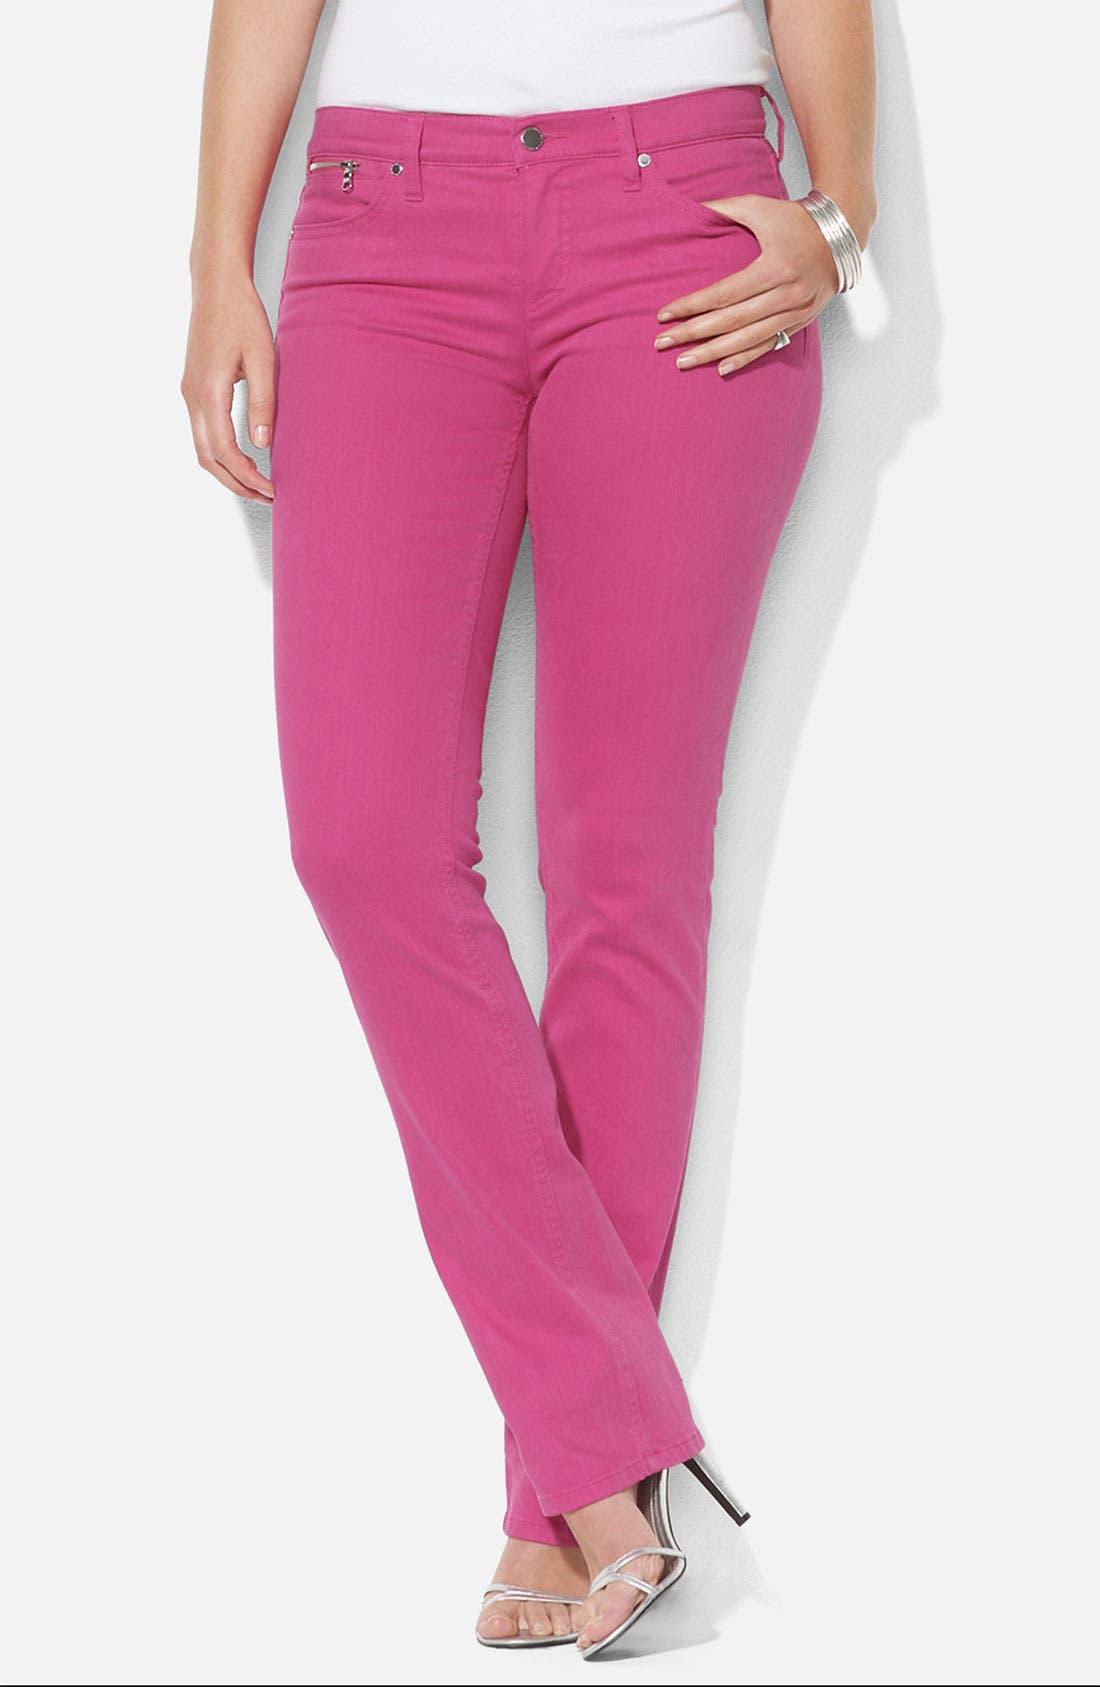 Alternate Image 1 Selected - Lauren Ralph Lauren Slim Straight Leg Colored Jeans (Plus)